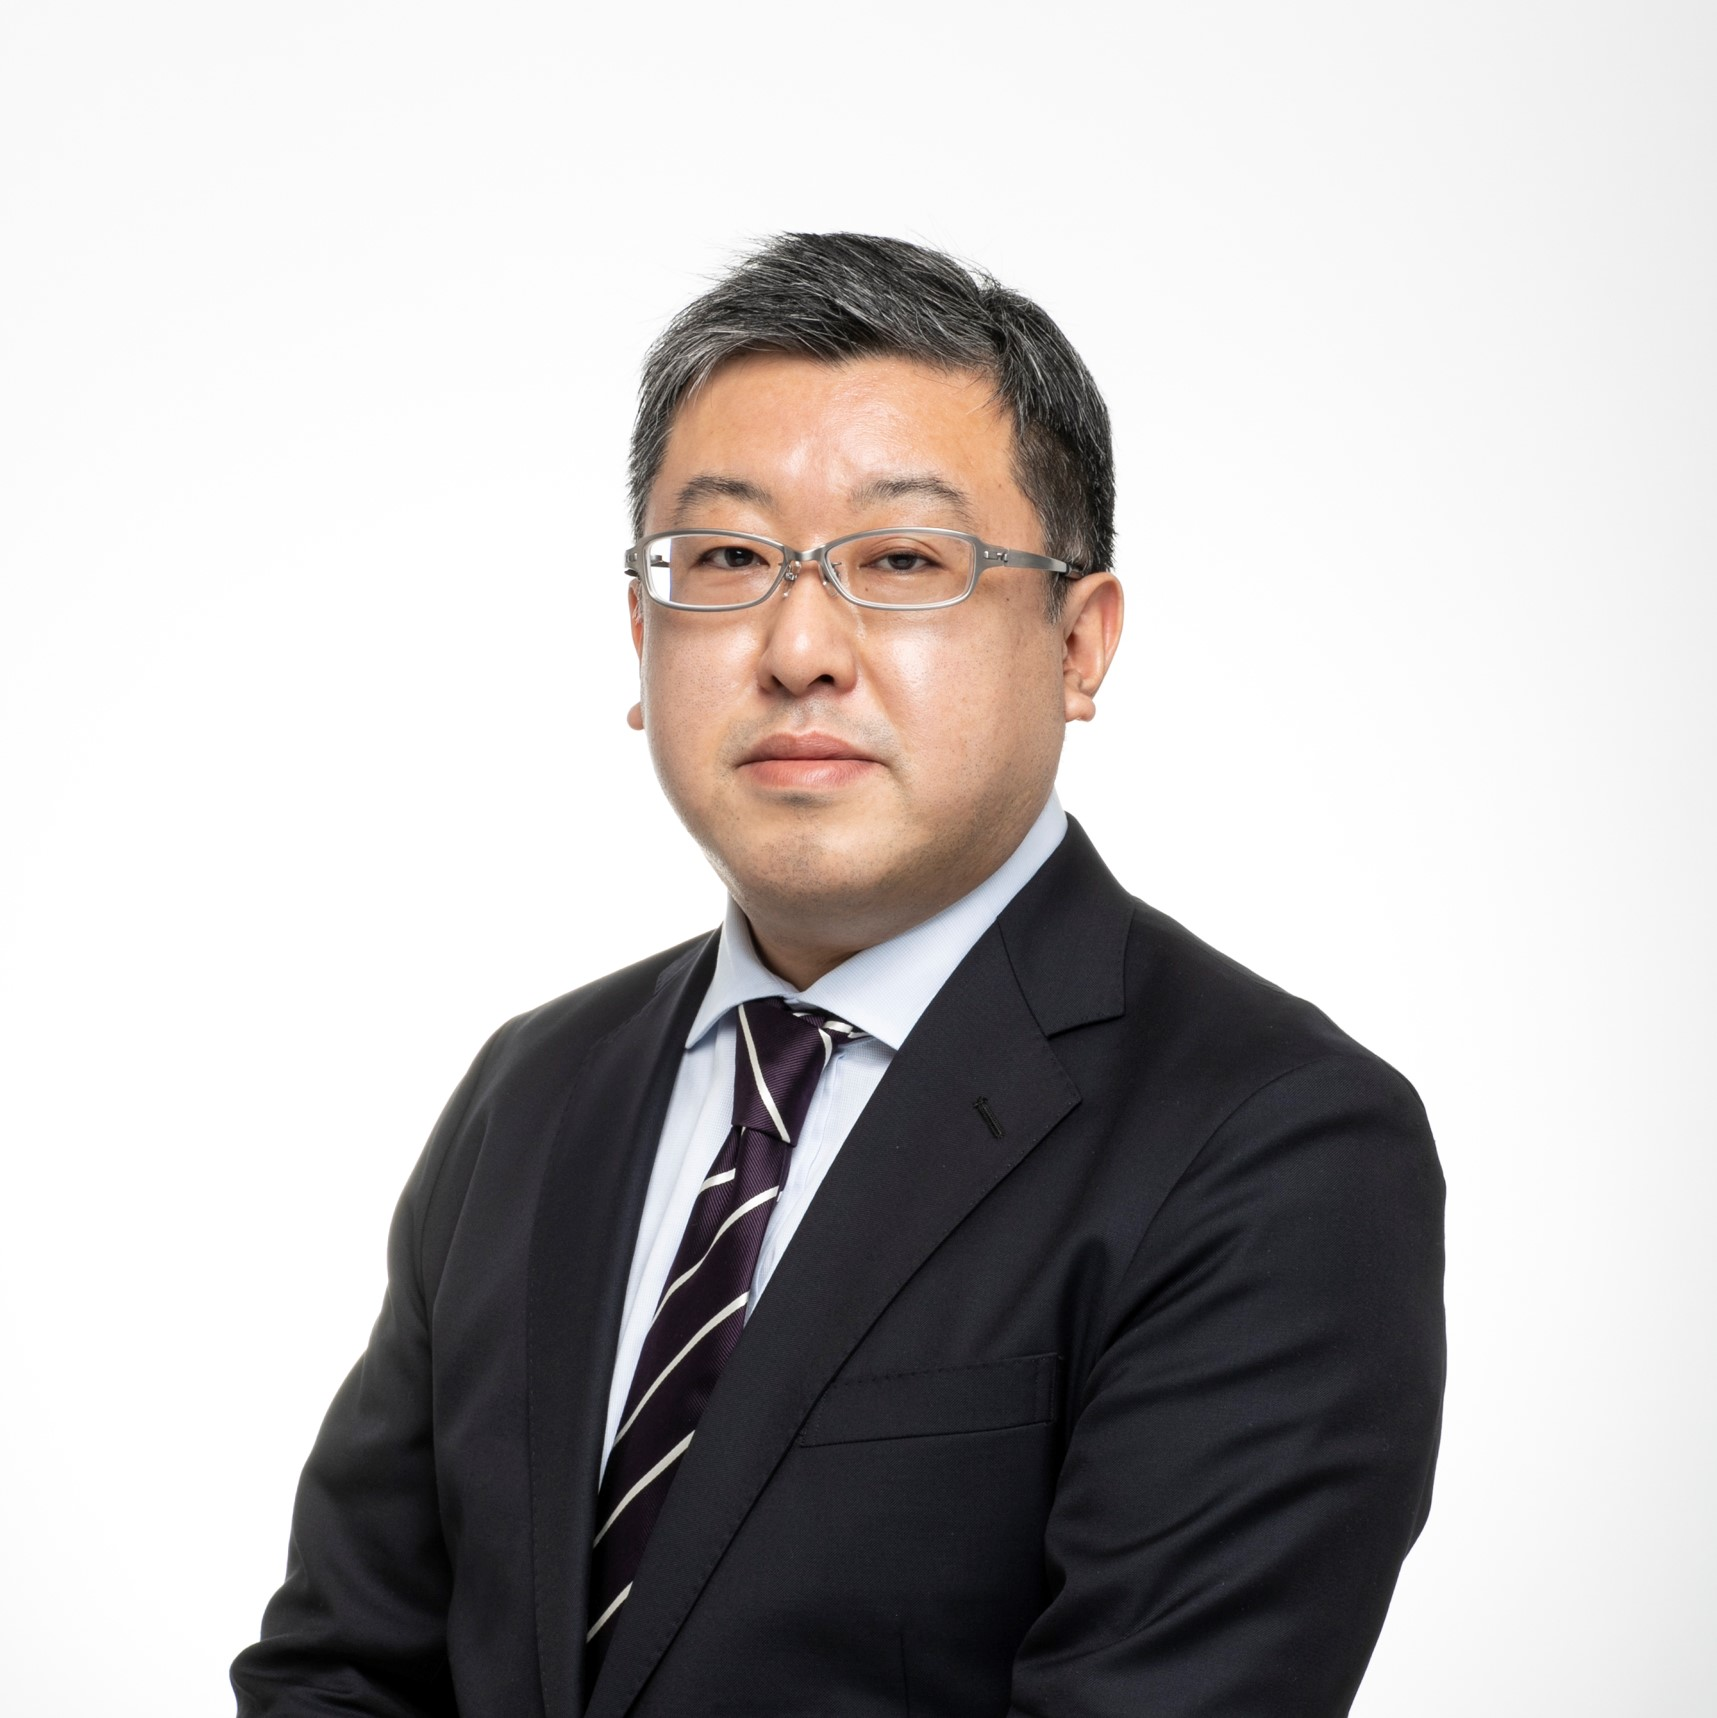 Kei Hosoya